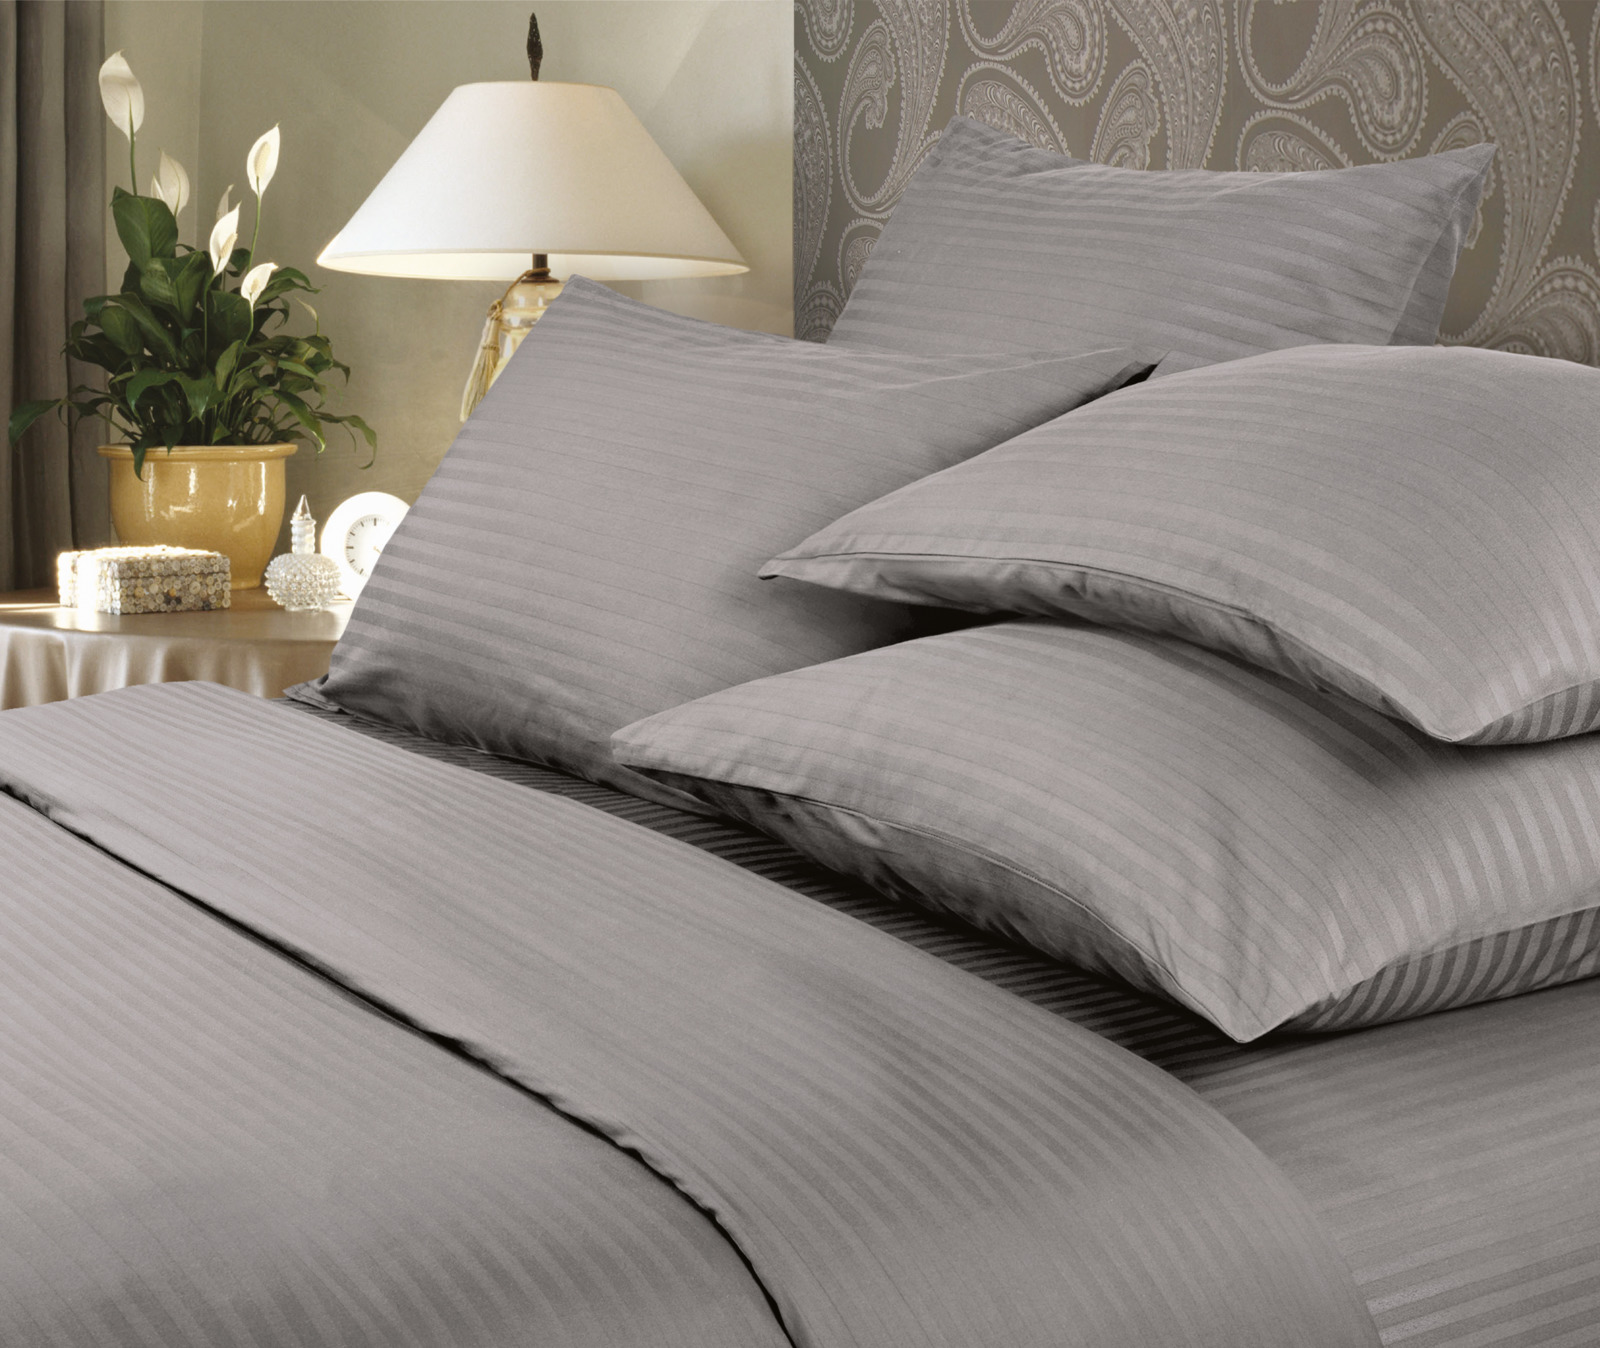 цена Комплект белья Verossa Gray, евро, наволочки 50x70 и 70x70 онлайн в 2017 году